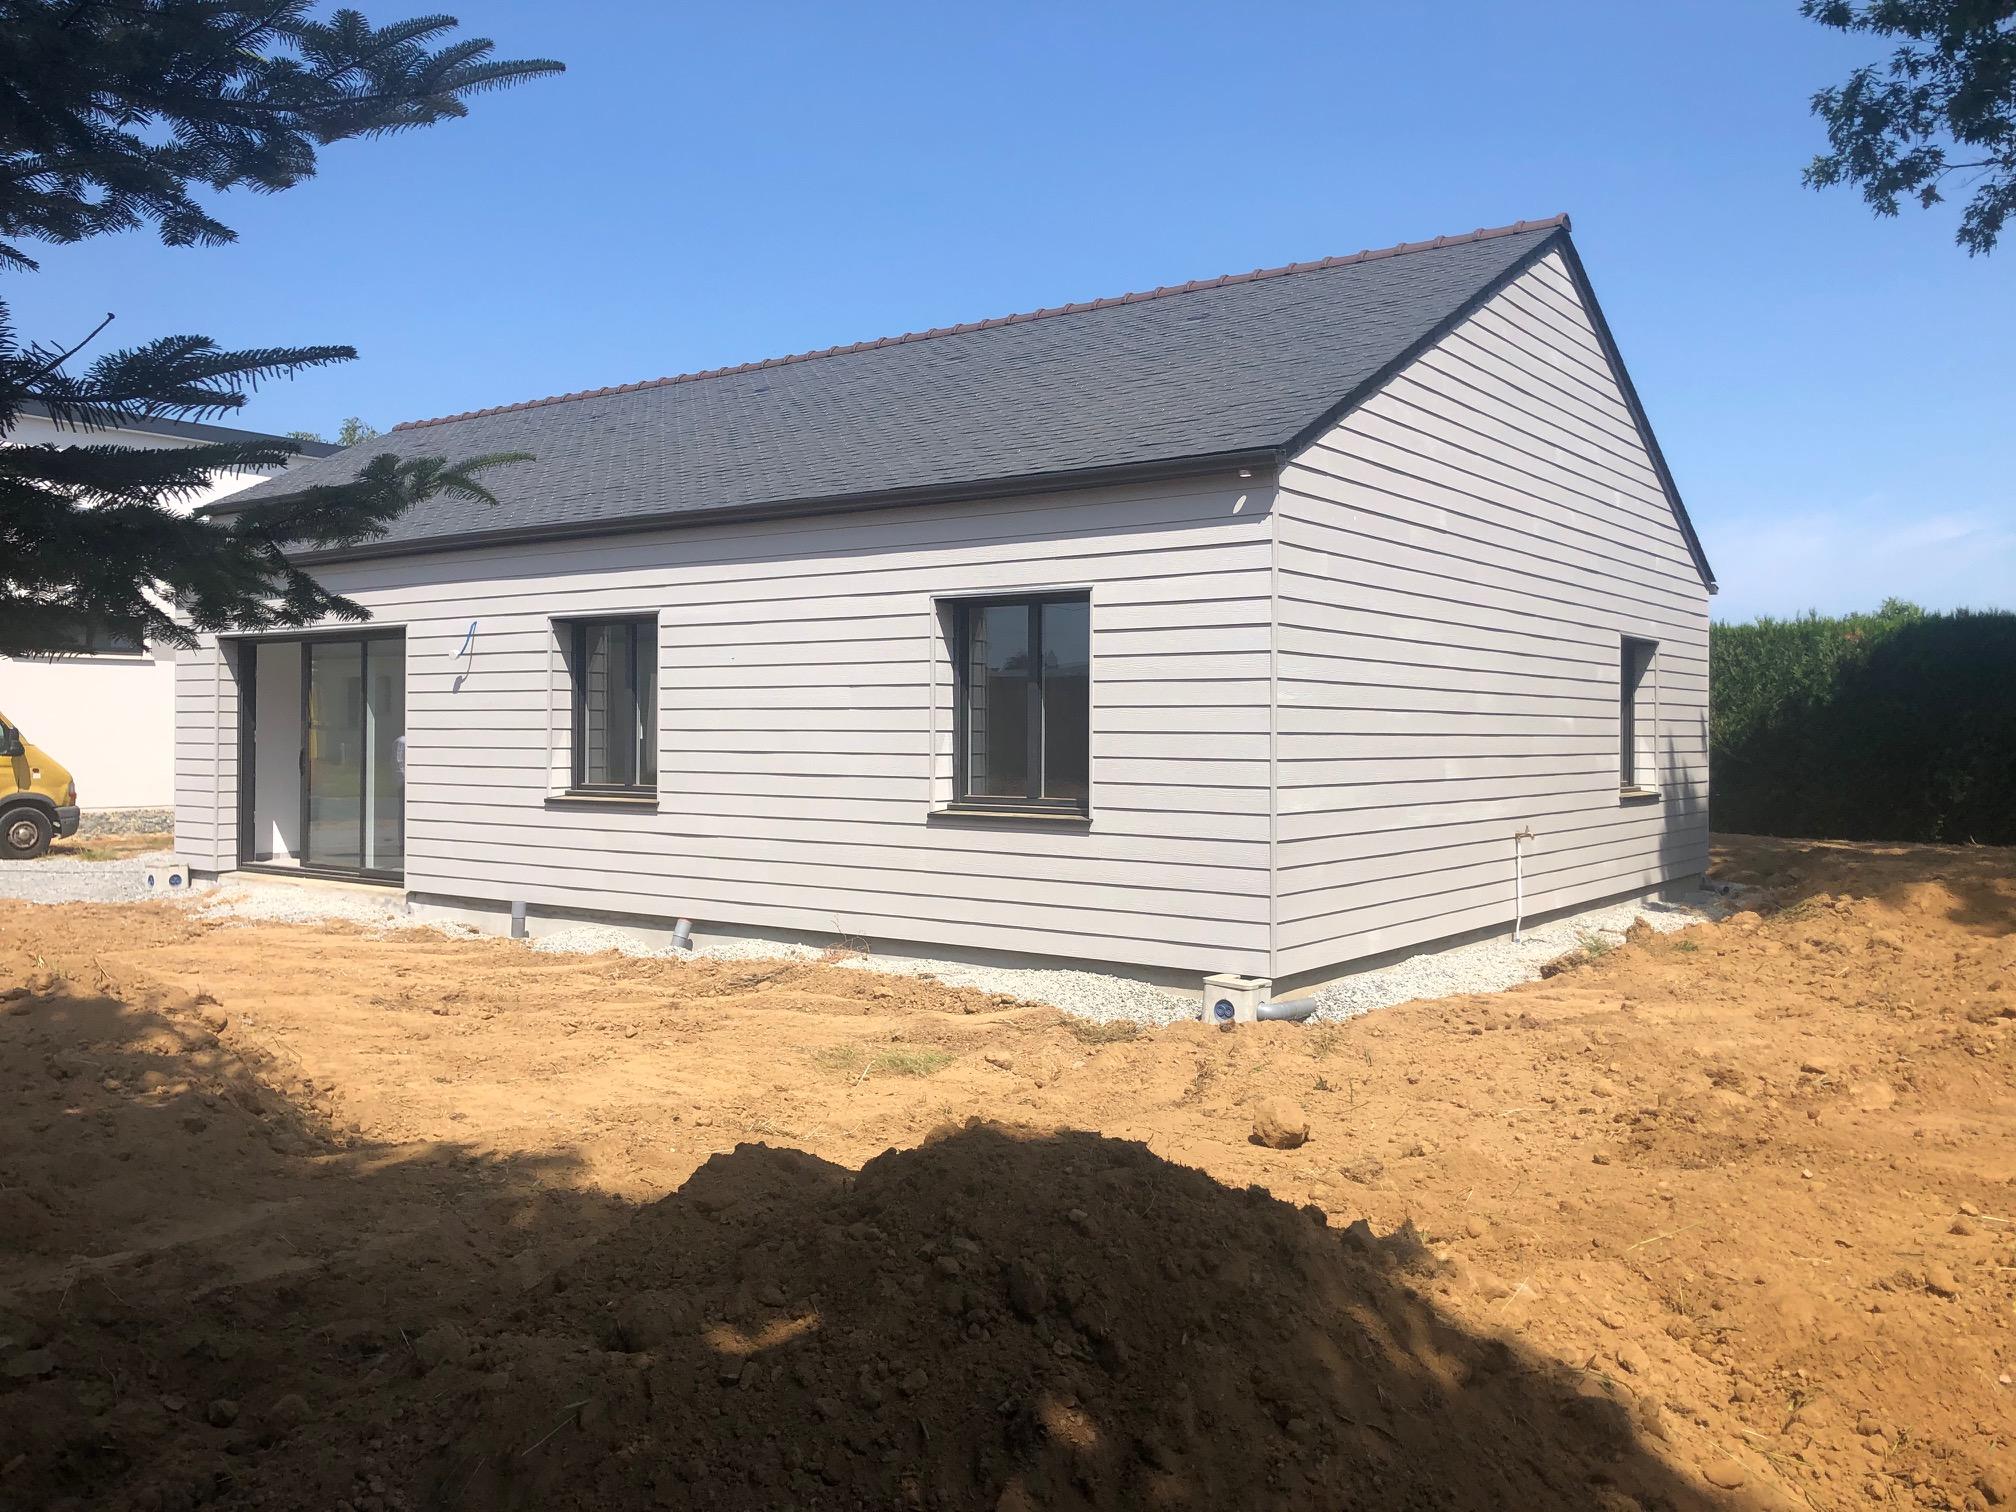 Maison à ossature bois Bardage James Hardie, Menuiseries ALU BOUVET gamme Novaltuce 2